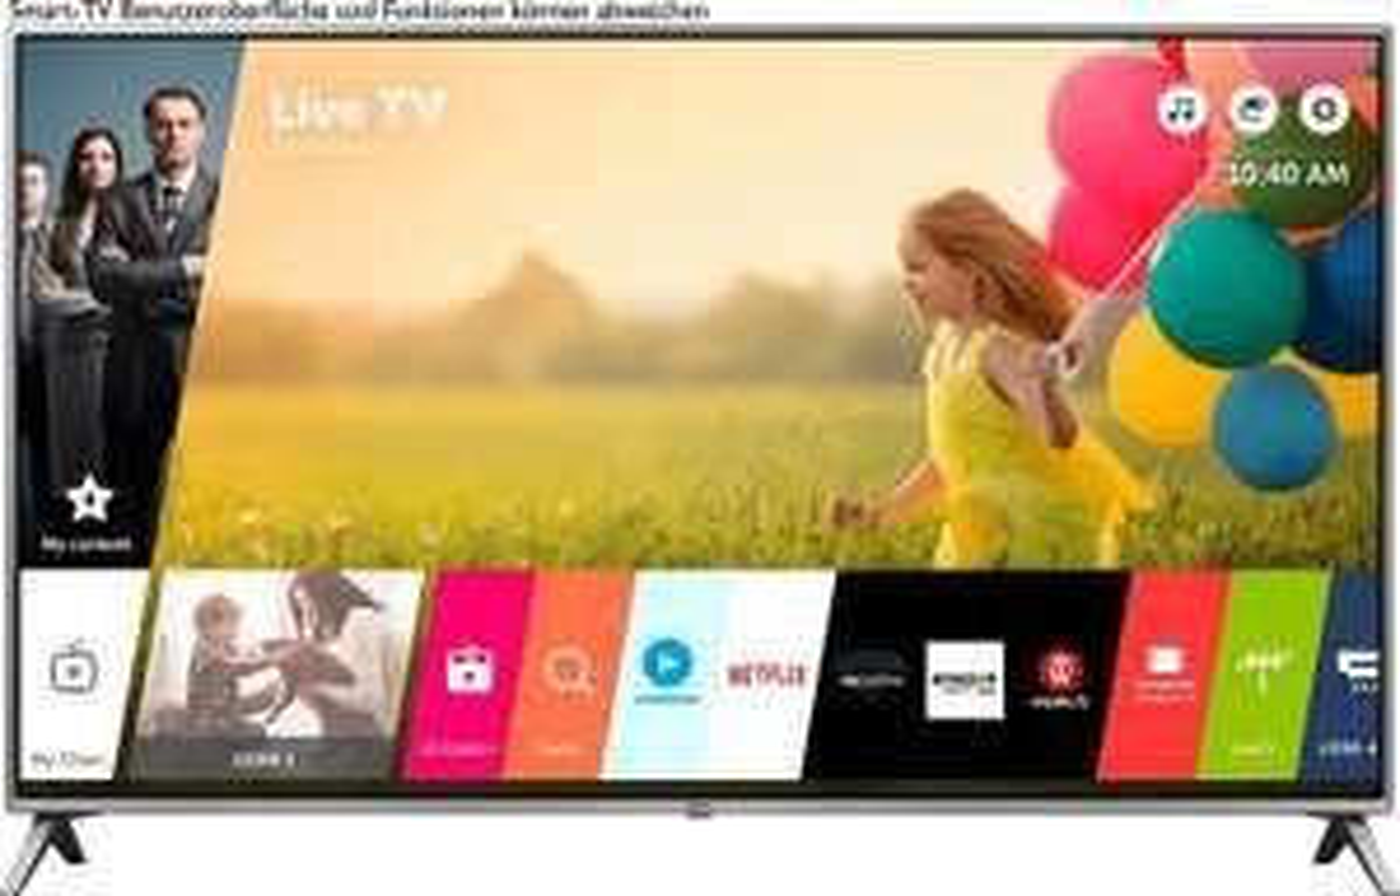 LG 65UK6500LLA 164 cm (65 Zoll) Fernseher (Super UHD, Triple Tuner, 4K Active HDR, Smart TV, WebOS) [eBay]